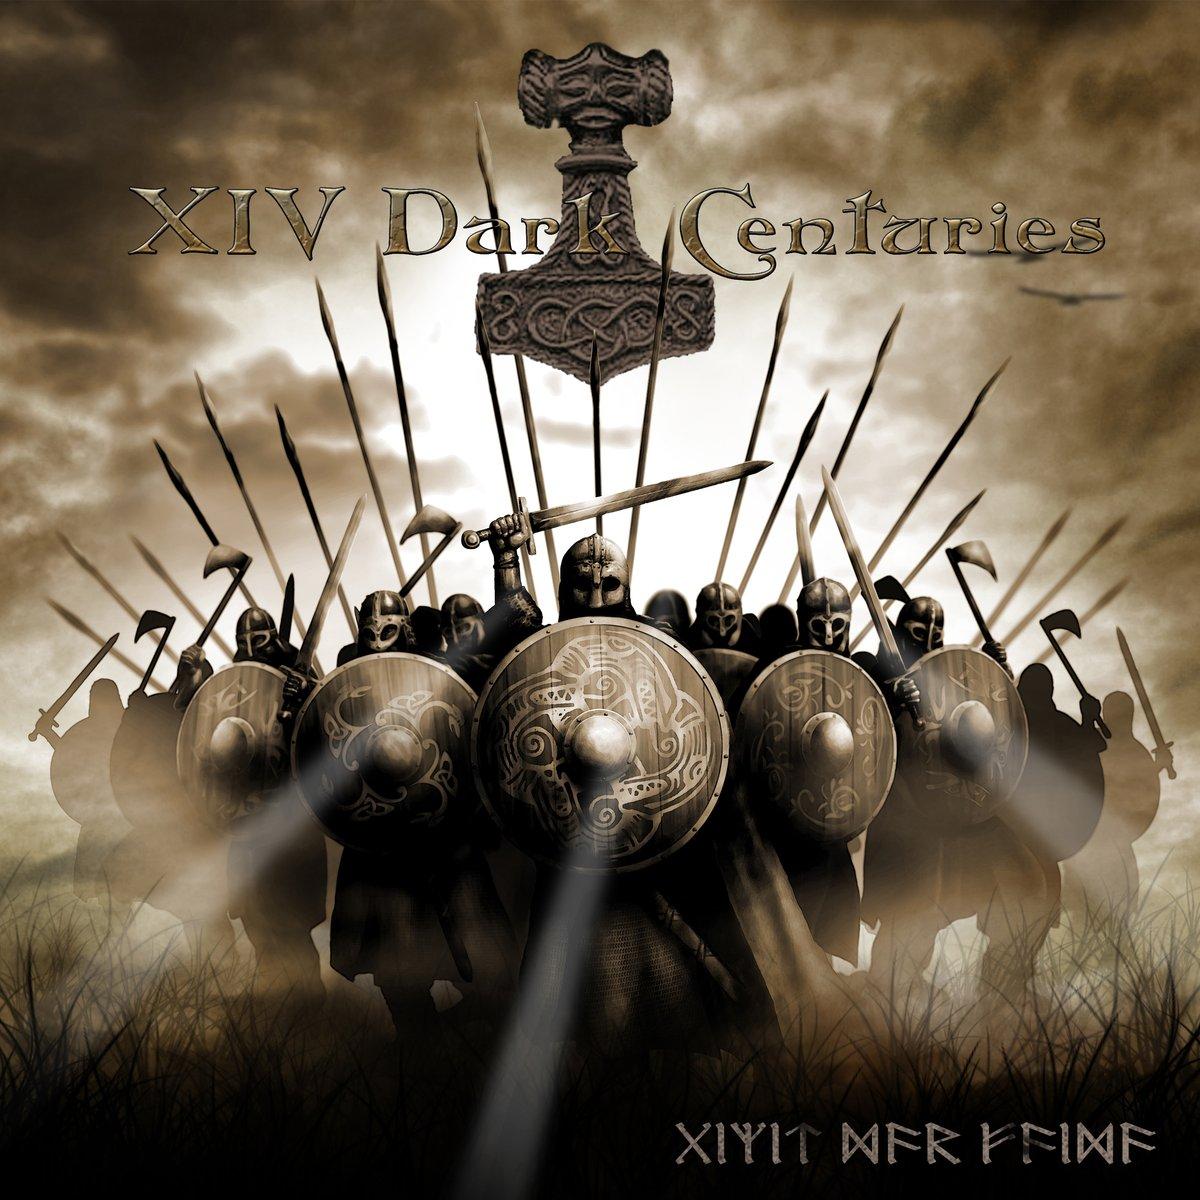 XIV Dark Centuries - Gizit dar Faida